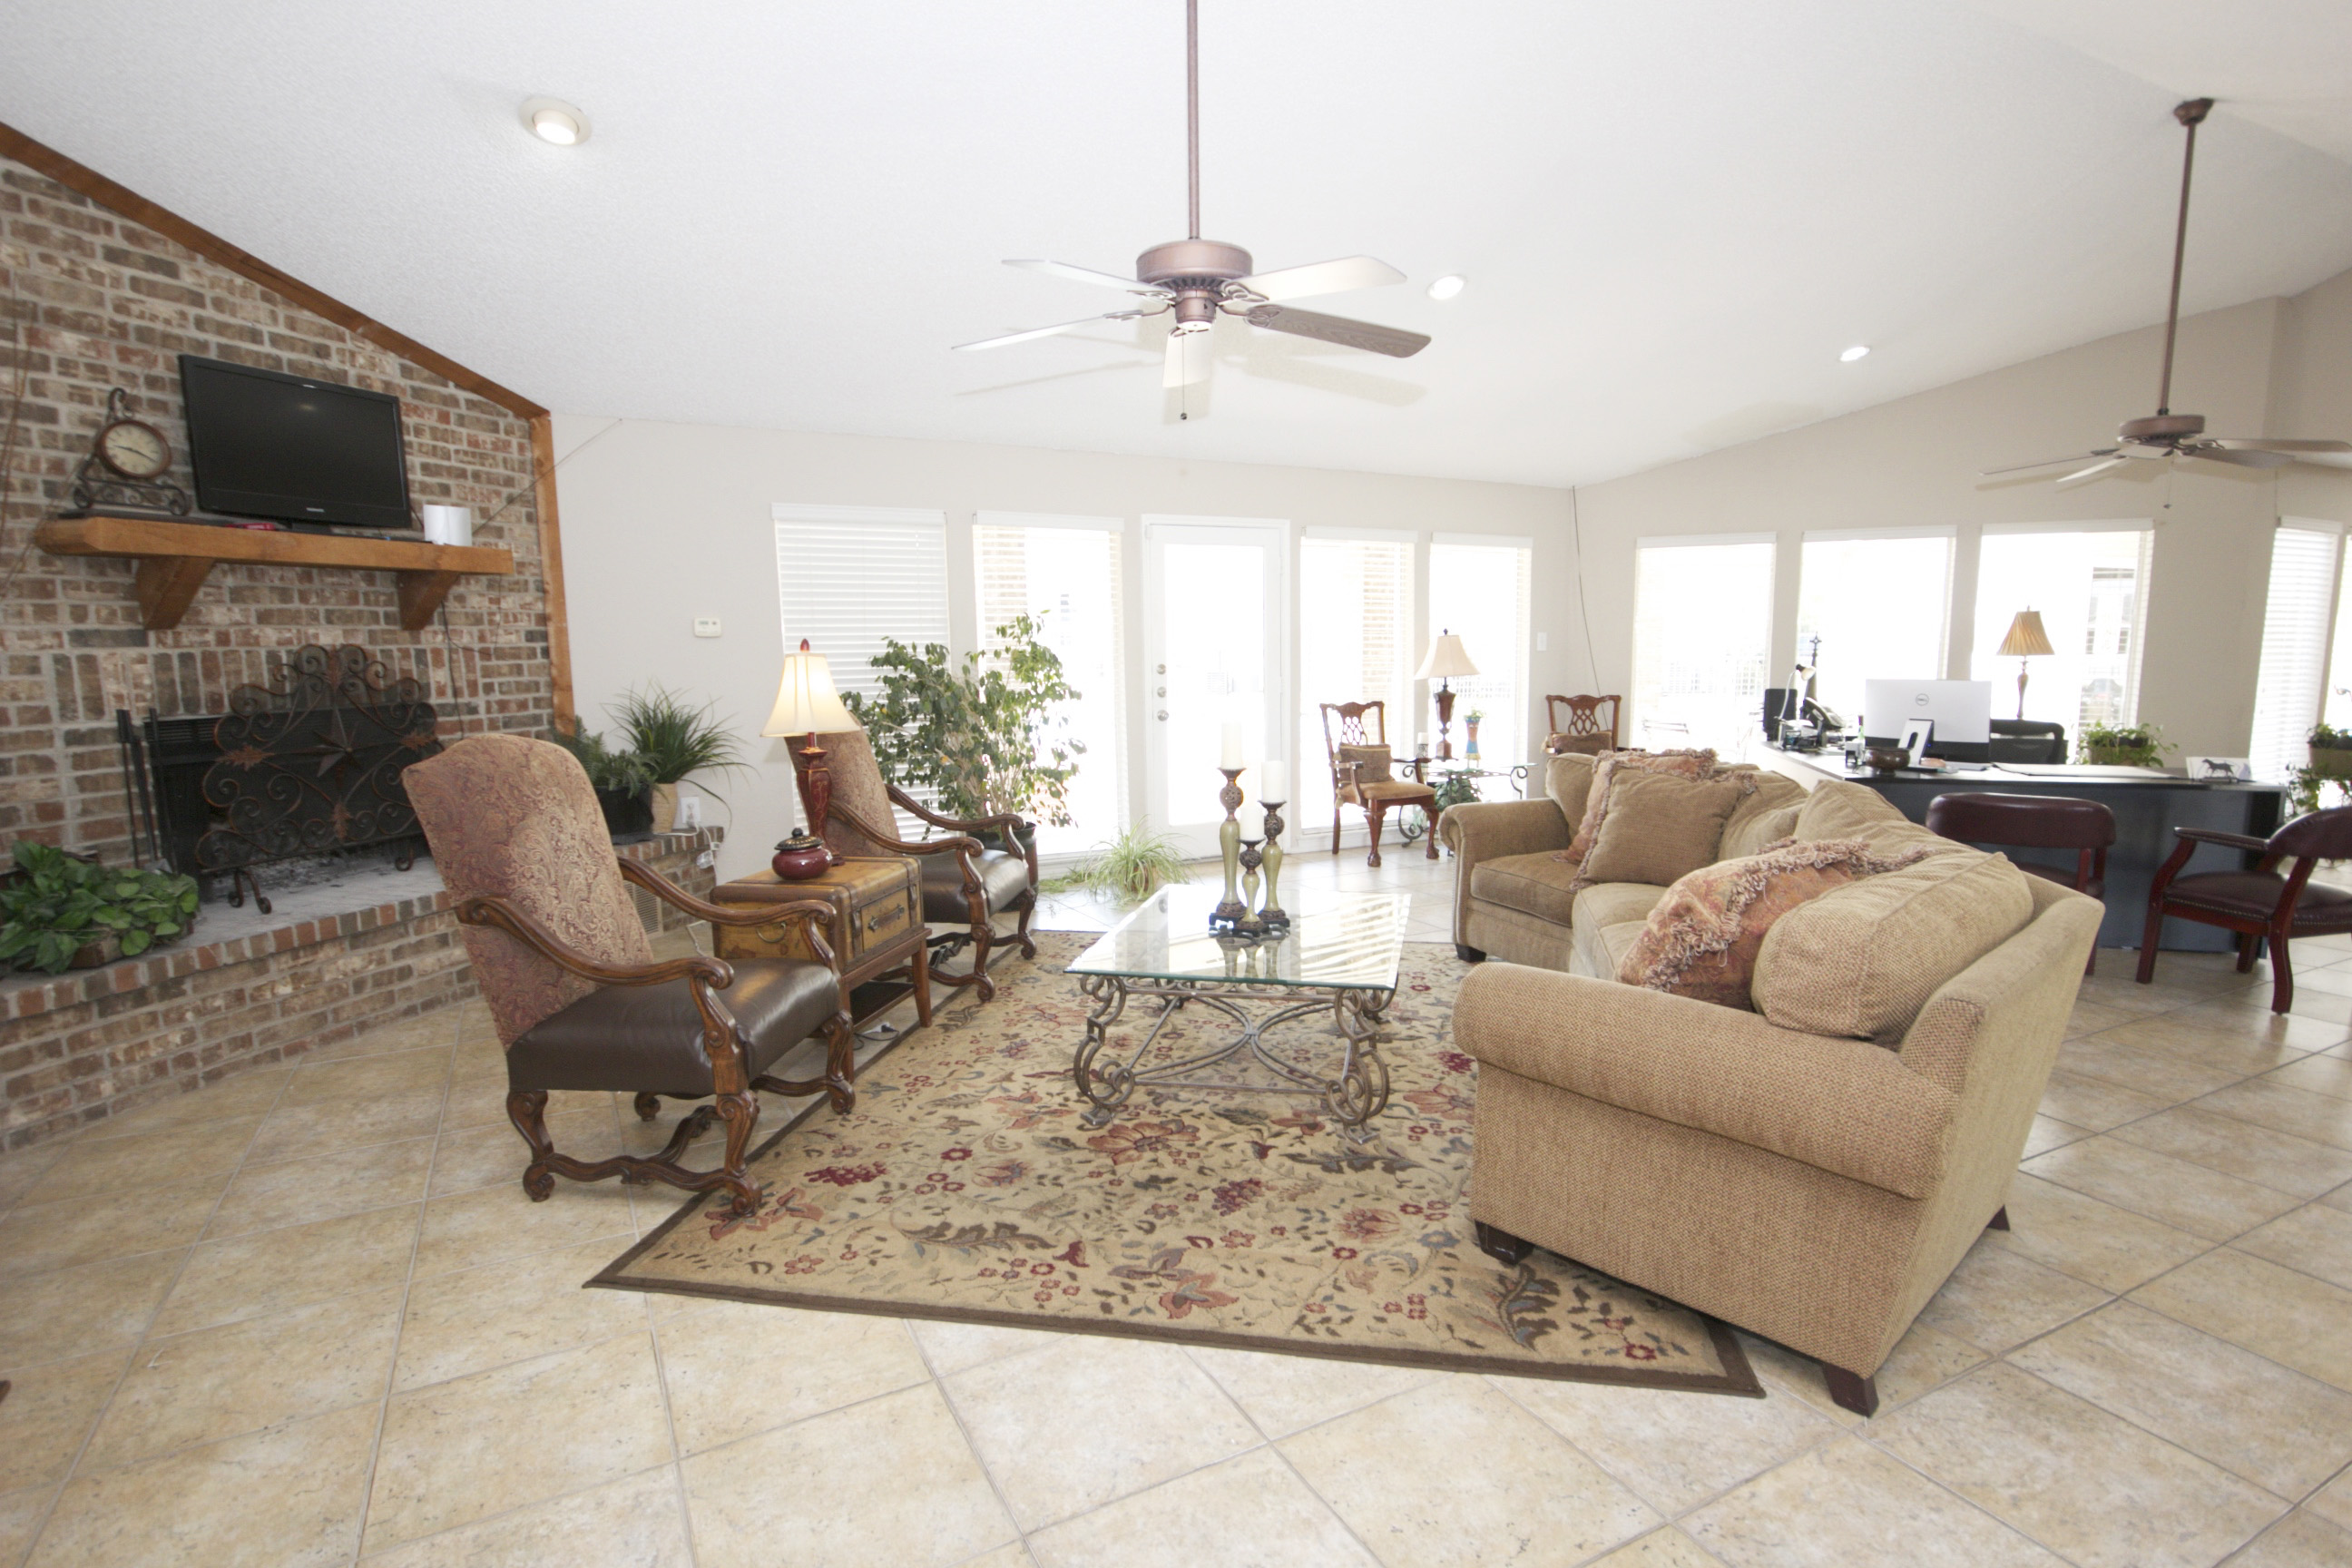 Premium Community Amenities at Quail Ridge Apartments in Grand Prairie, Texas